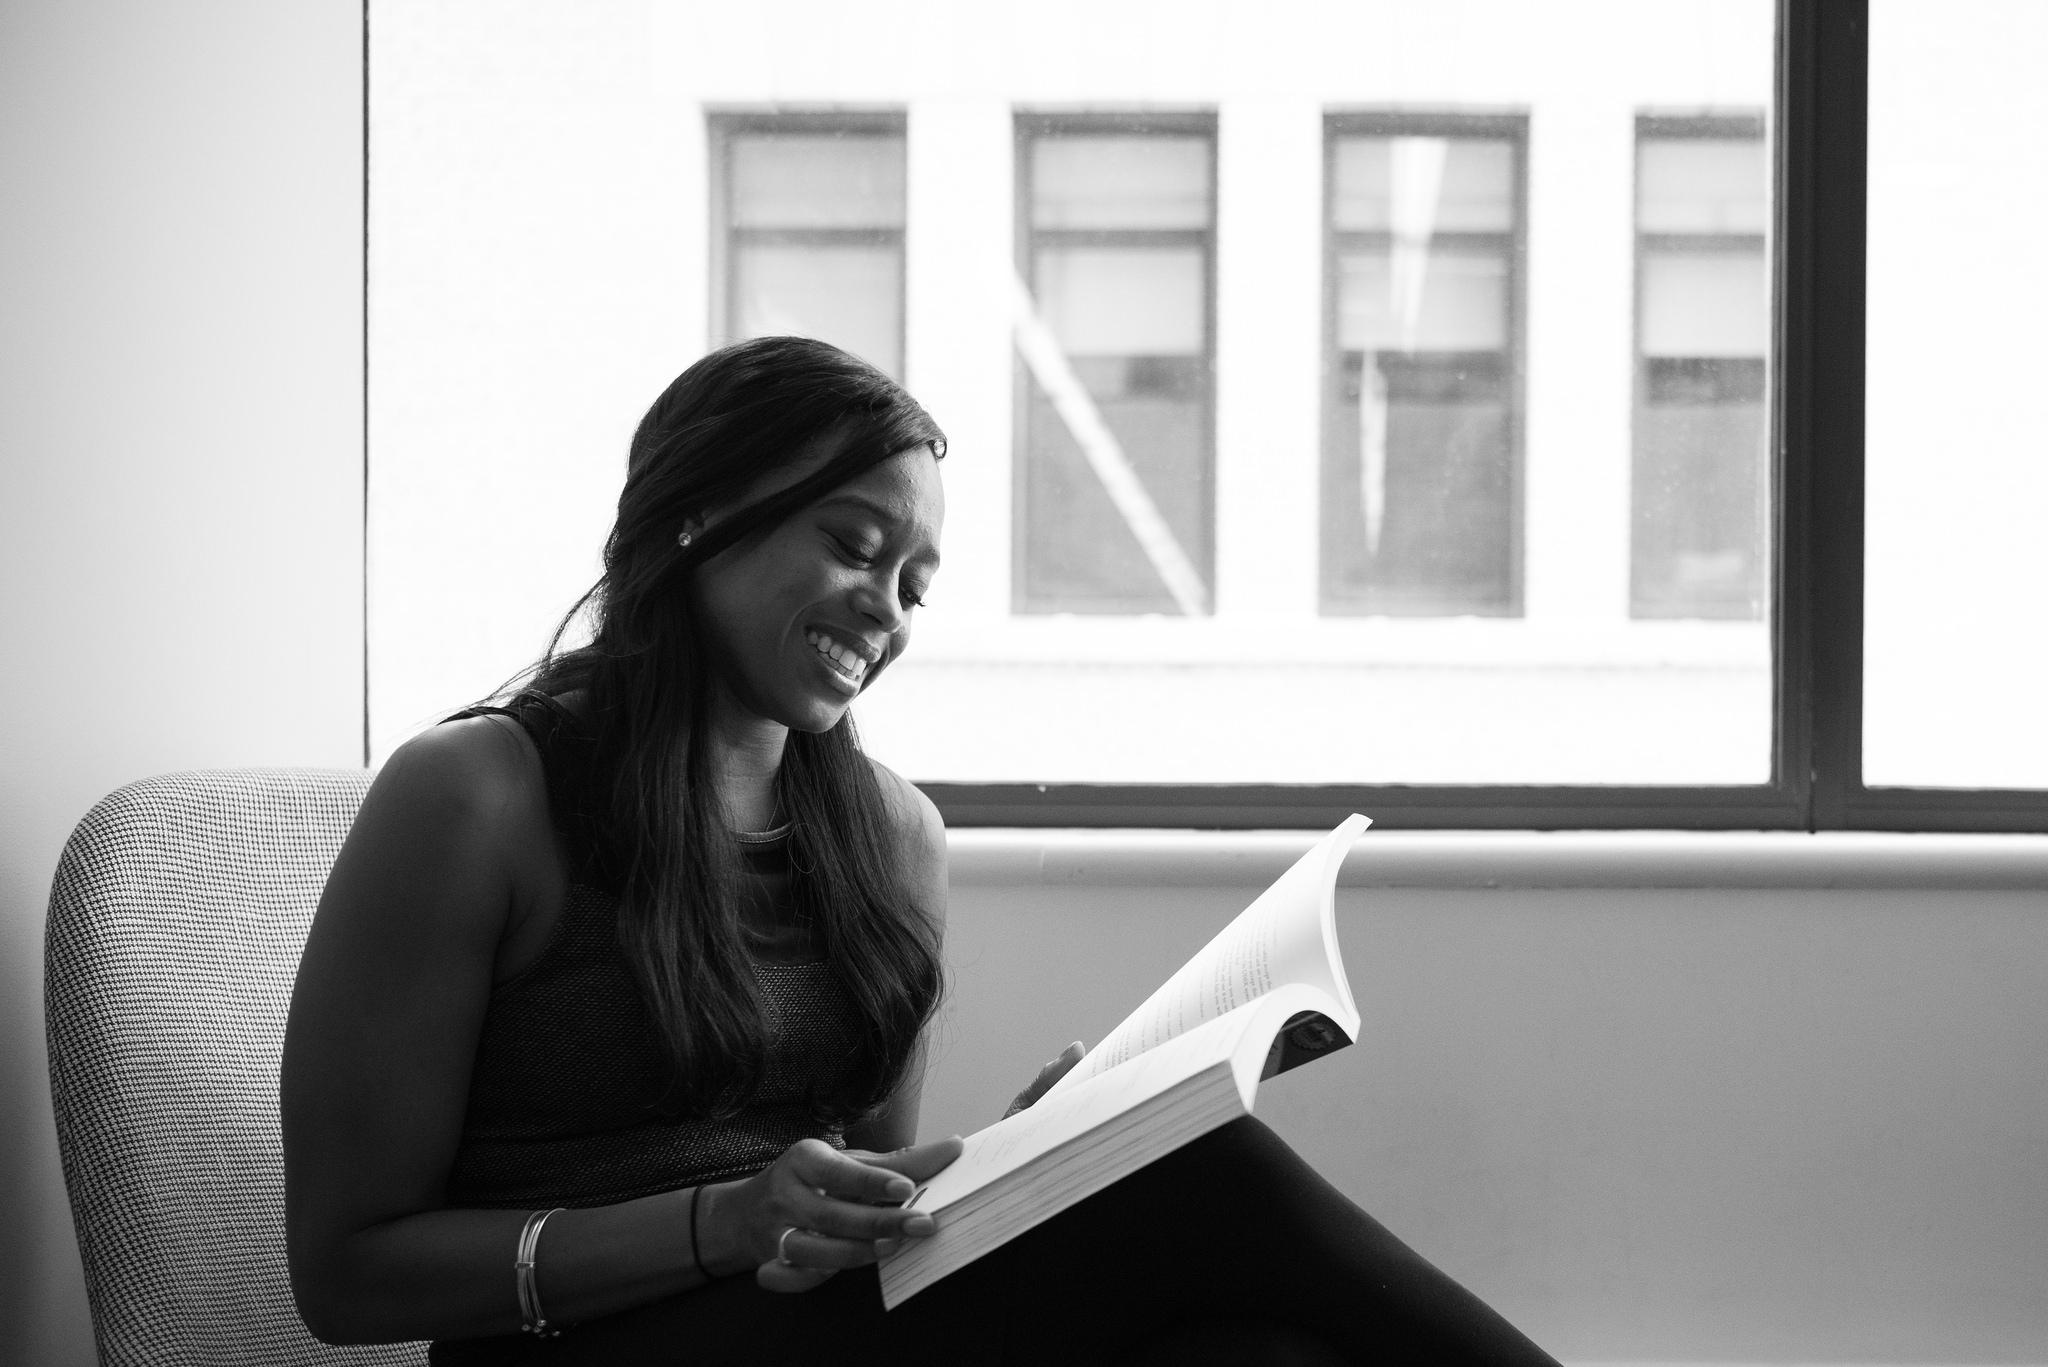 Photo Of Women Reading